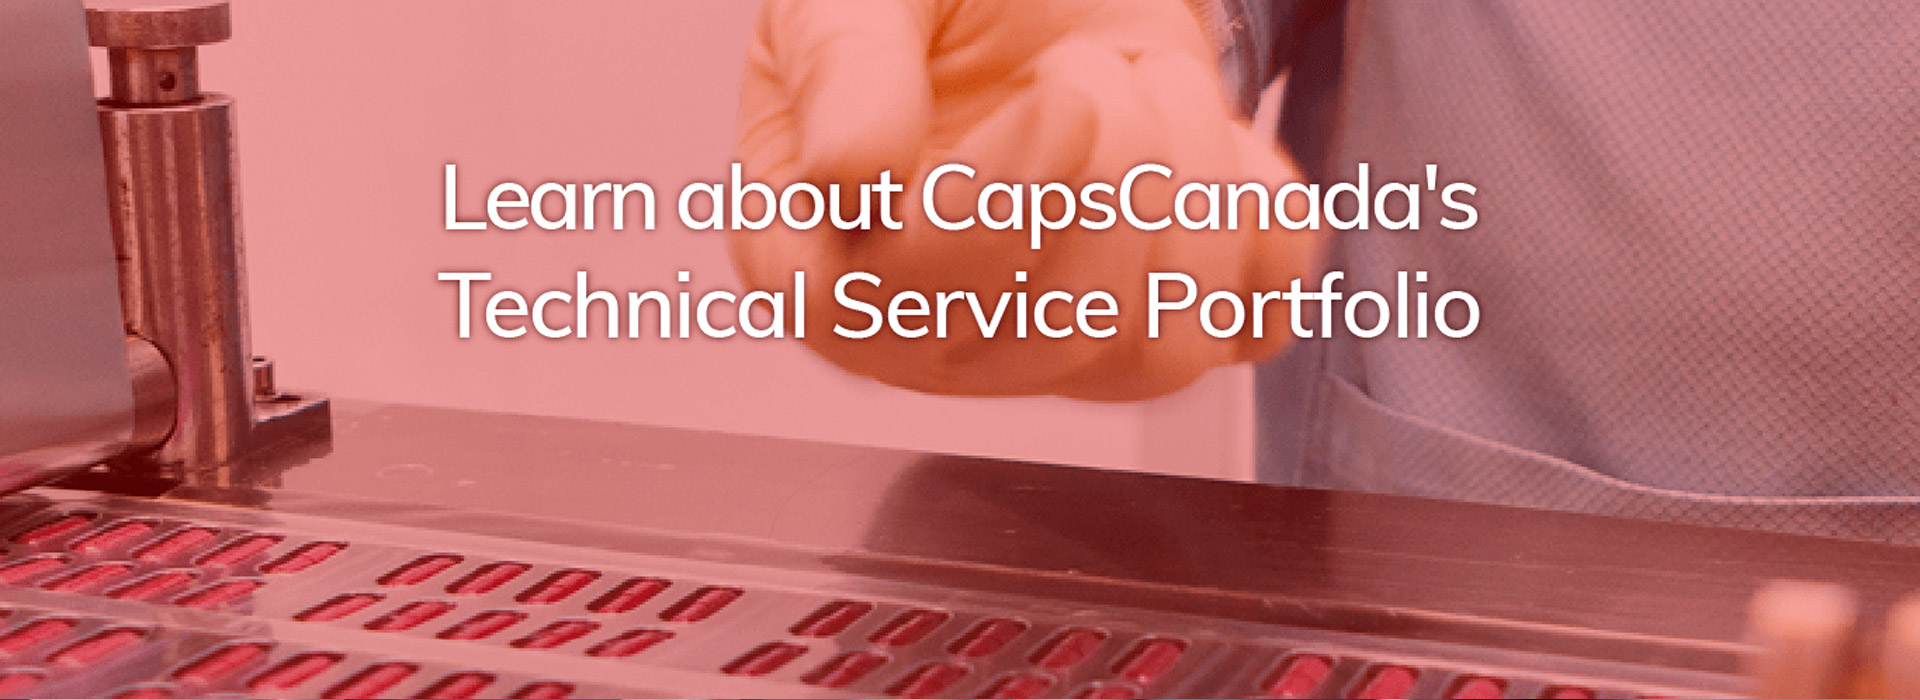 Technical Portfolio: Learn about CapsCanada's services